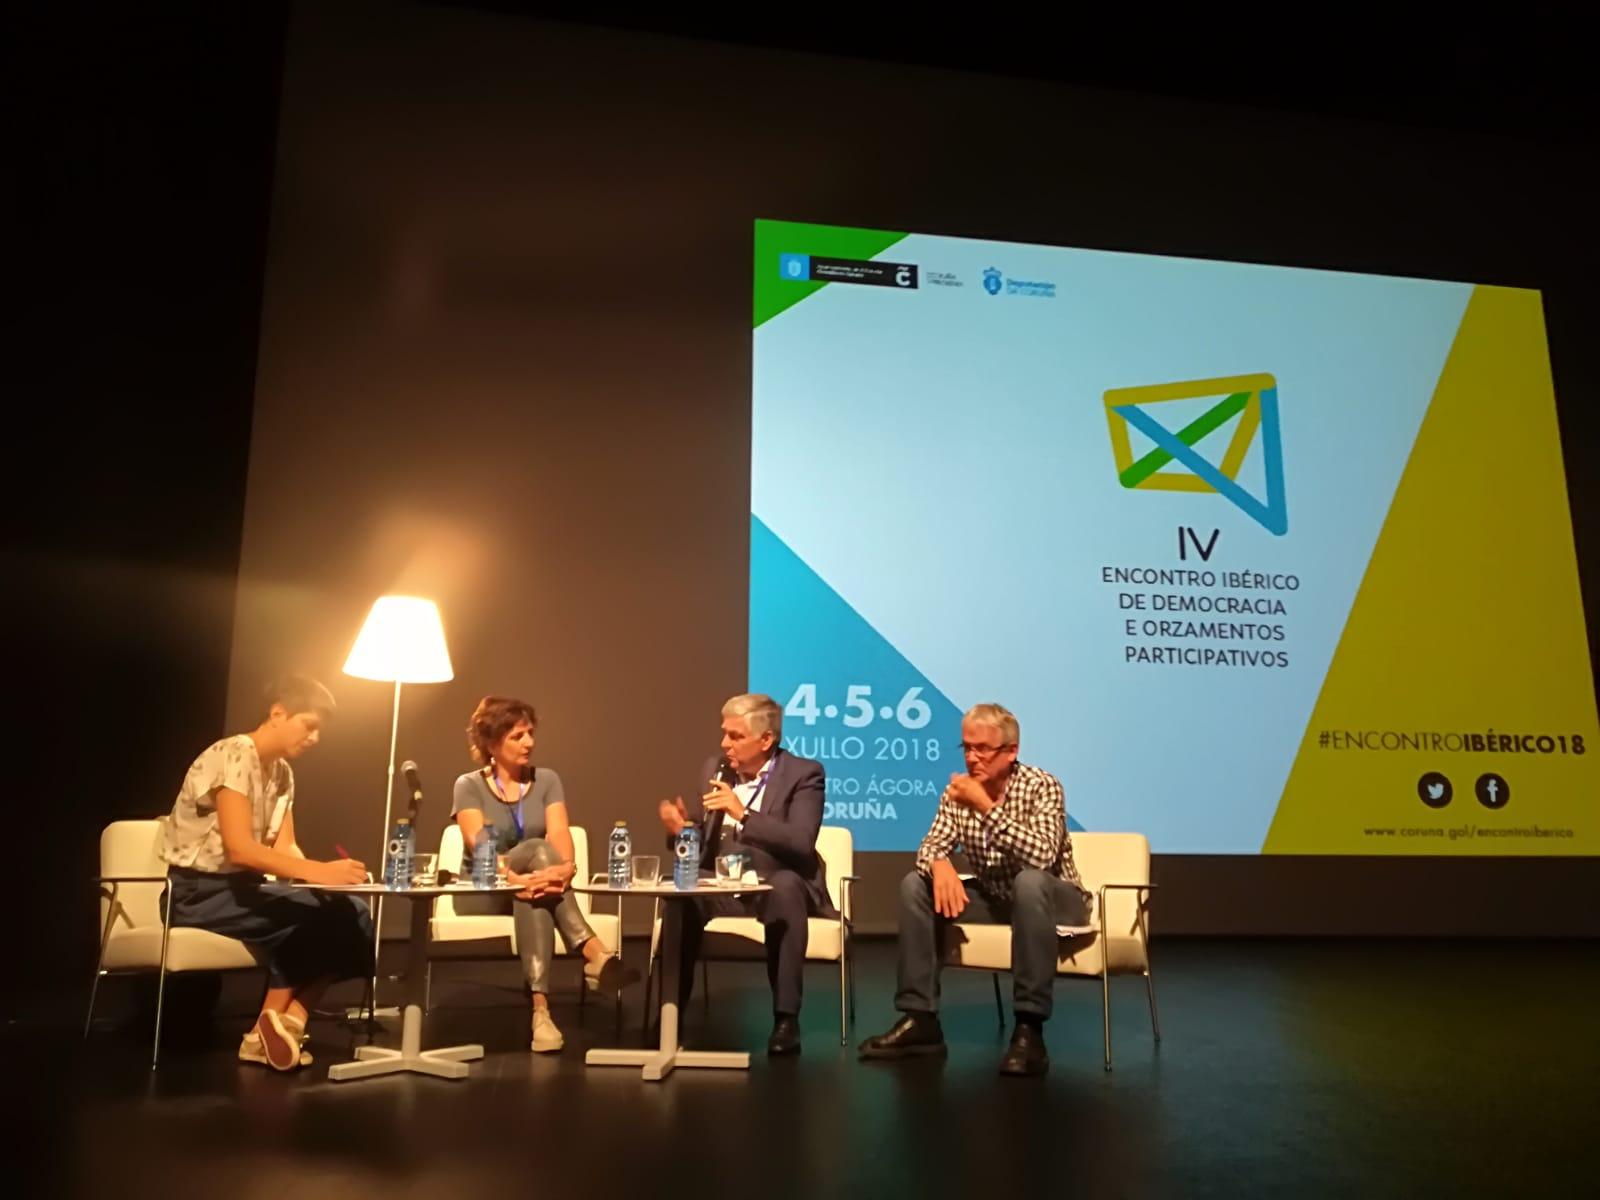 experiencia transfronteiriza de Tomiño e Cerveira no IV Encontro Ibérico de Democracia e Orzamentos Participativos